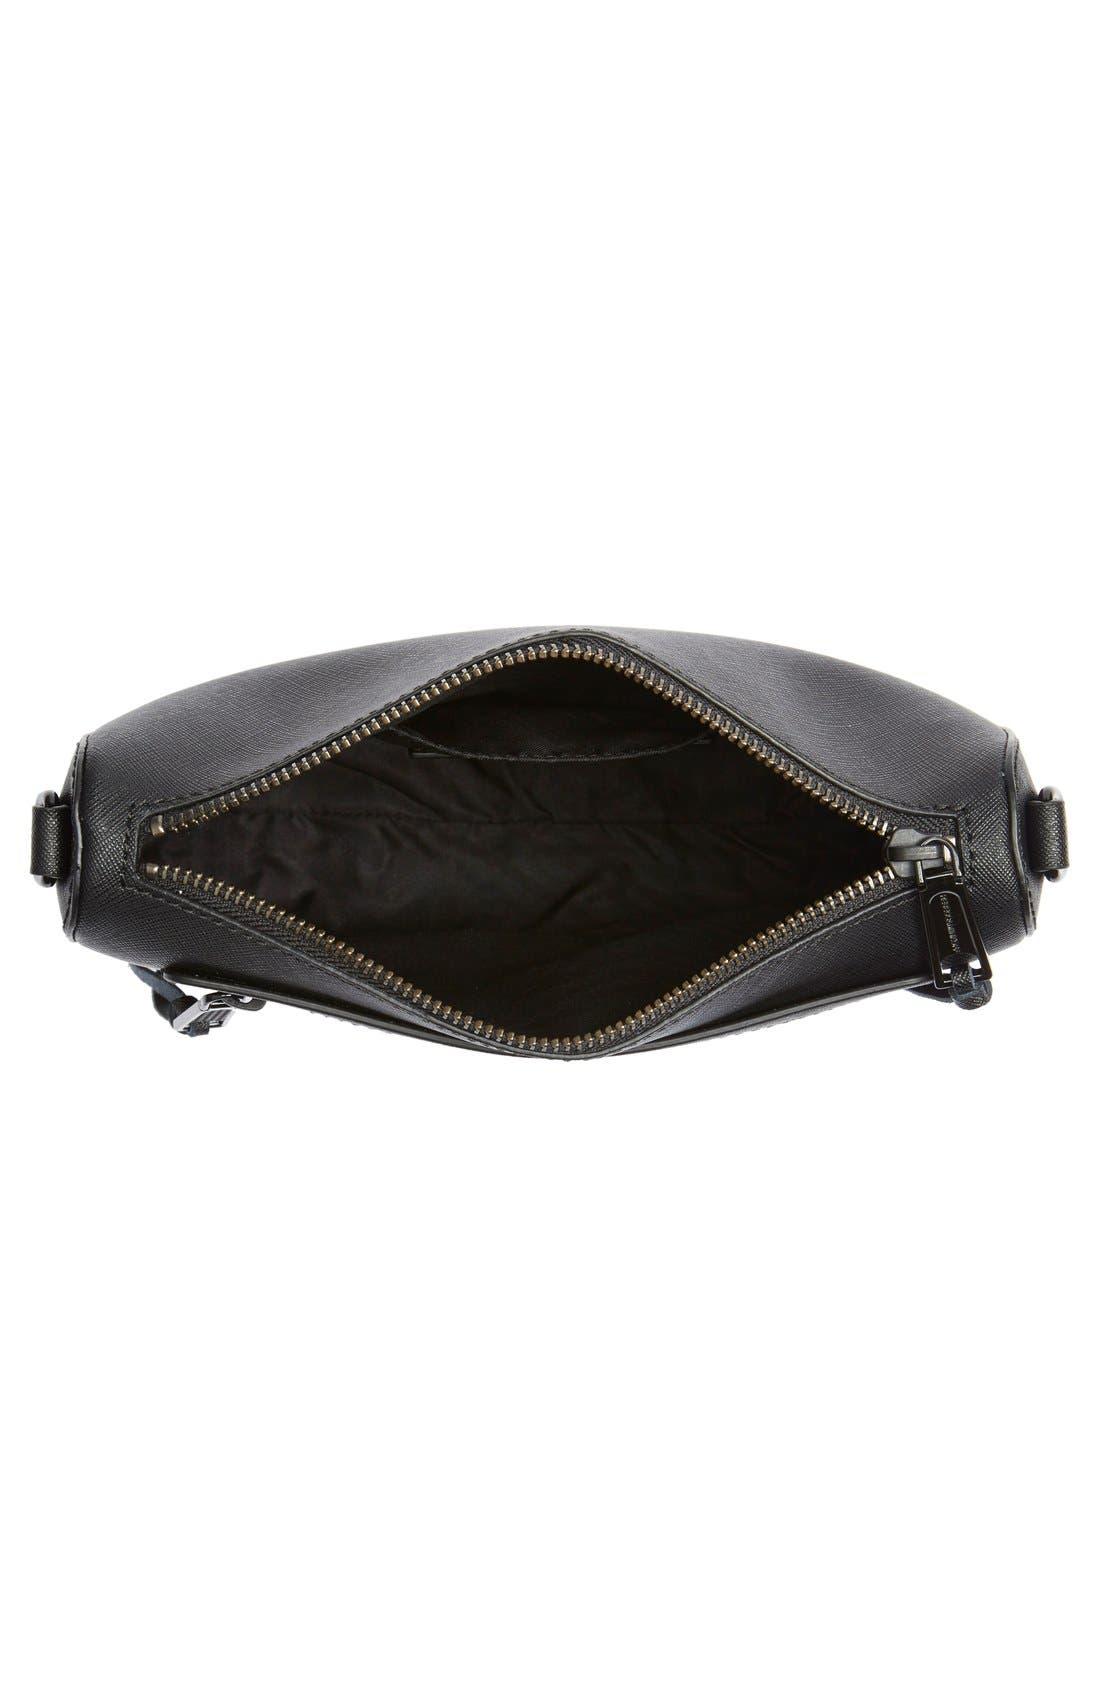 'Avery' Crossbody Bag,                             Alternate thumbnail 4, color,                             Black/ Black Hrdwr